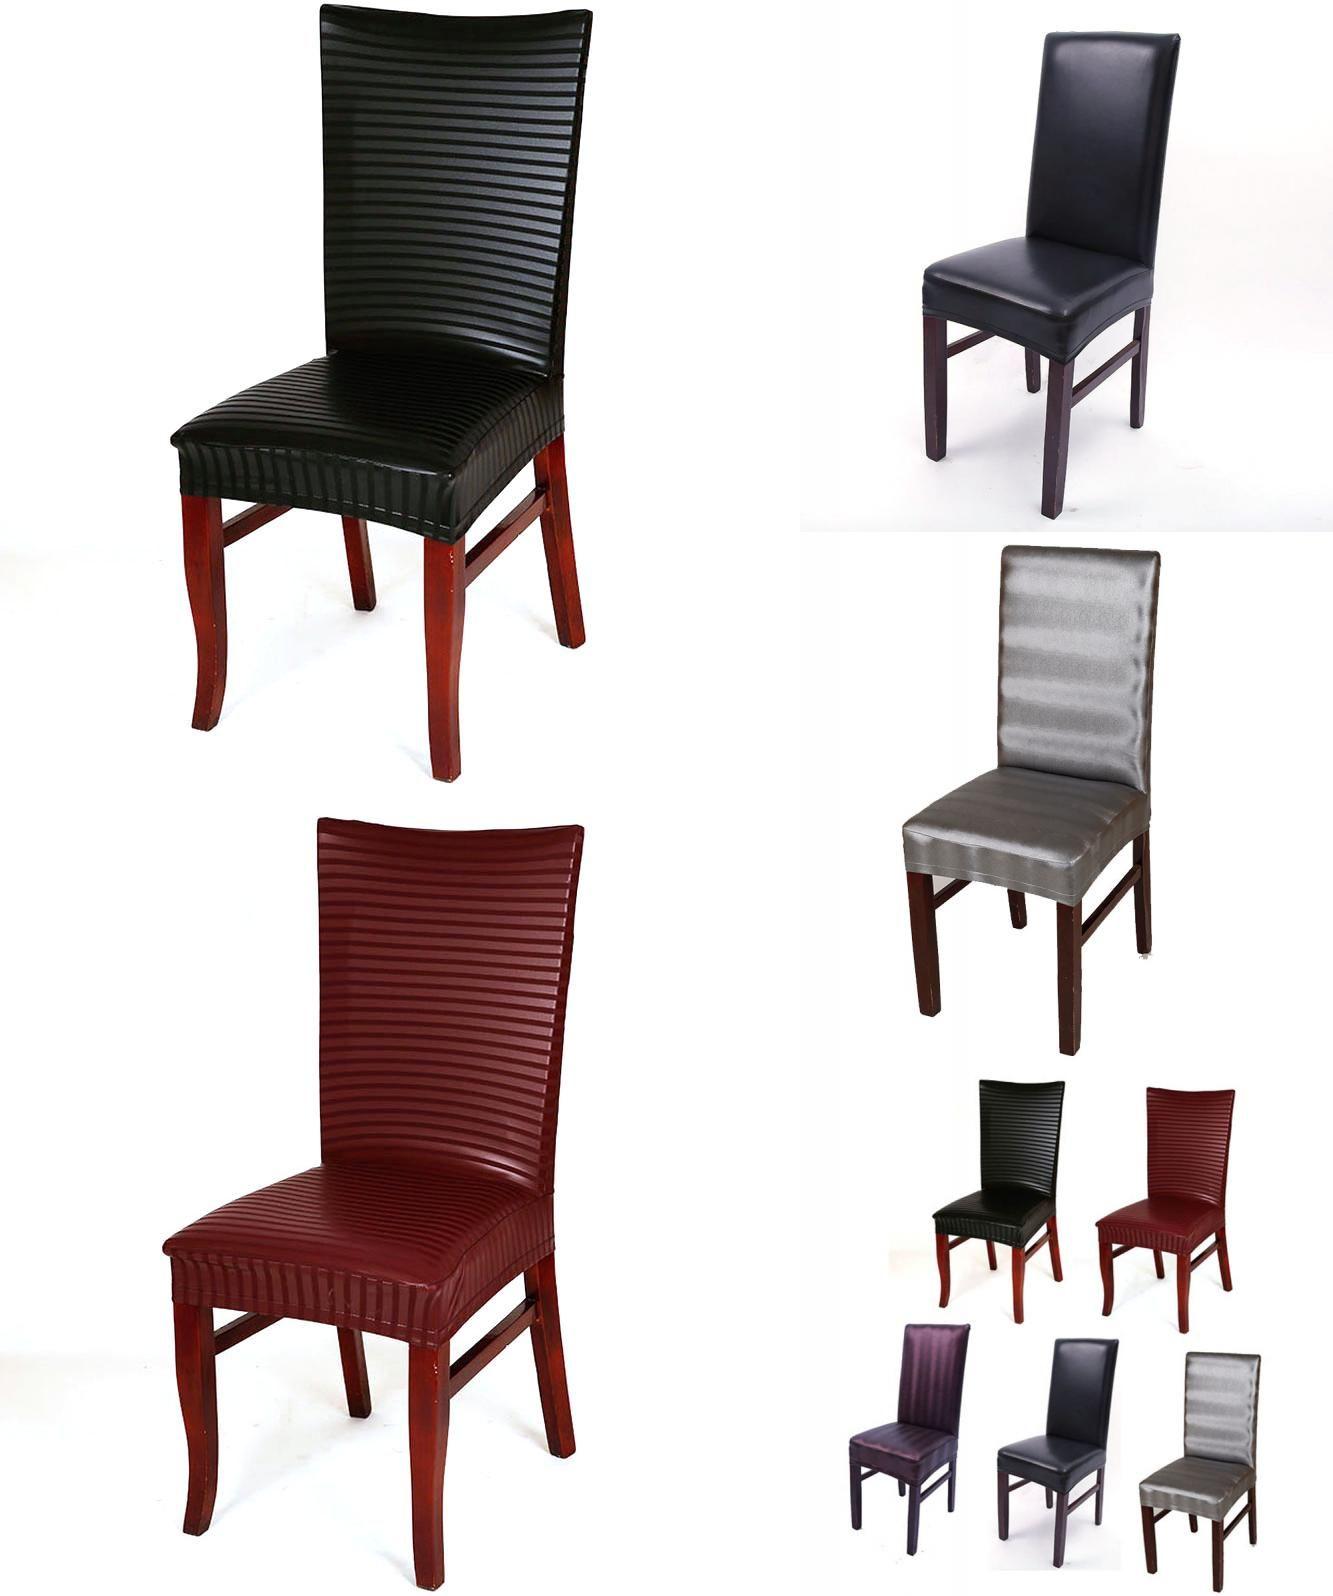 Visit to Buy] leather pu chair cover Elastic stoelhoezen eetkamer ...